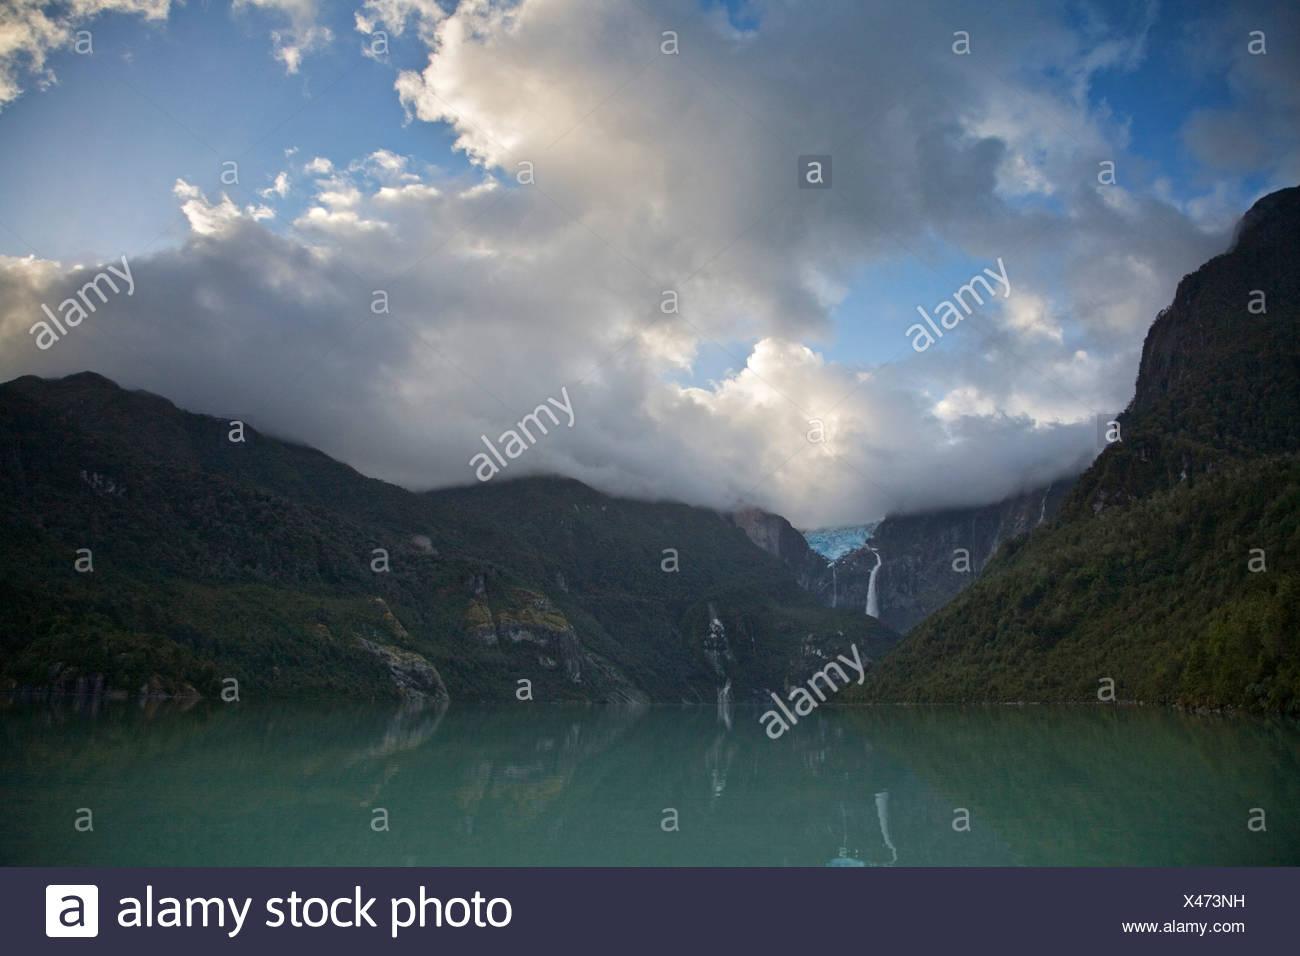 Laguna Tempanos and glacier Ventisquero Colgante, Park Queulat, Carretera Austral, Patagonia, Chile, South America - Stock Image